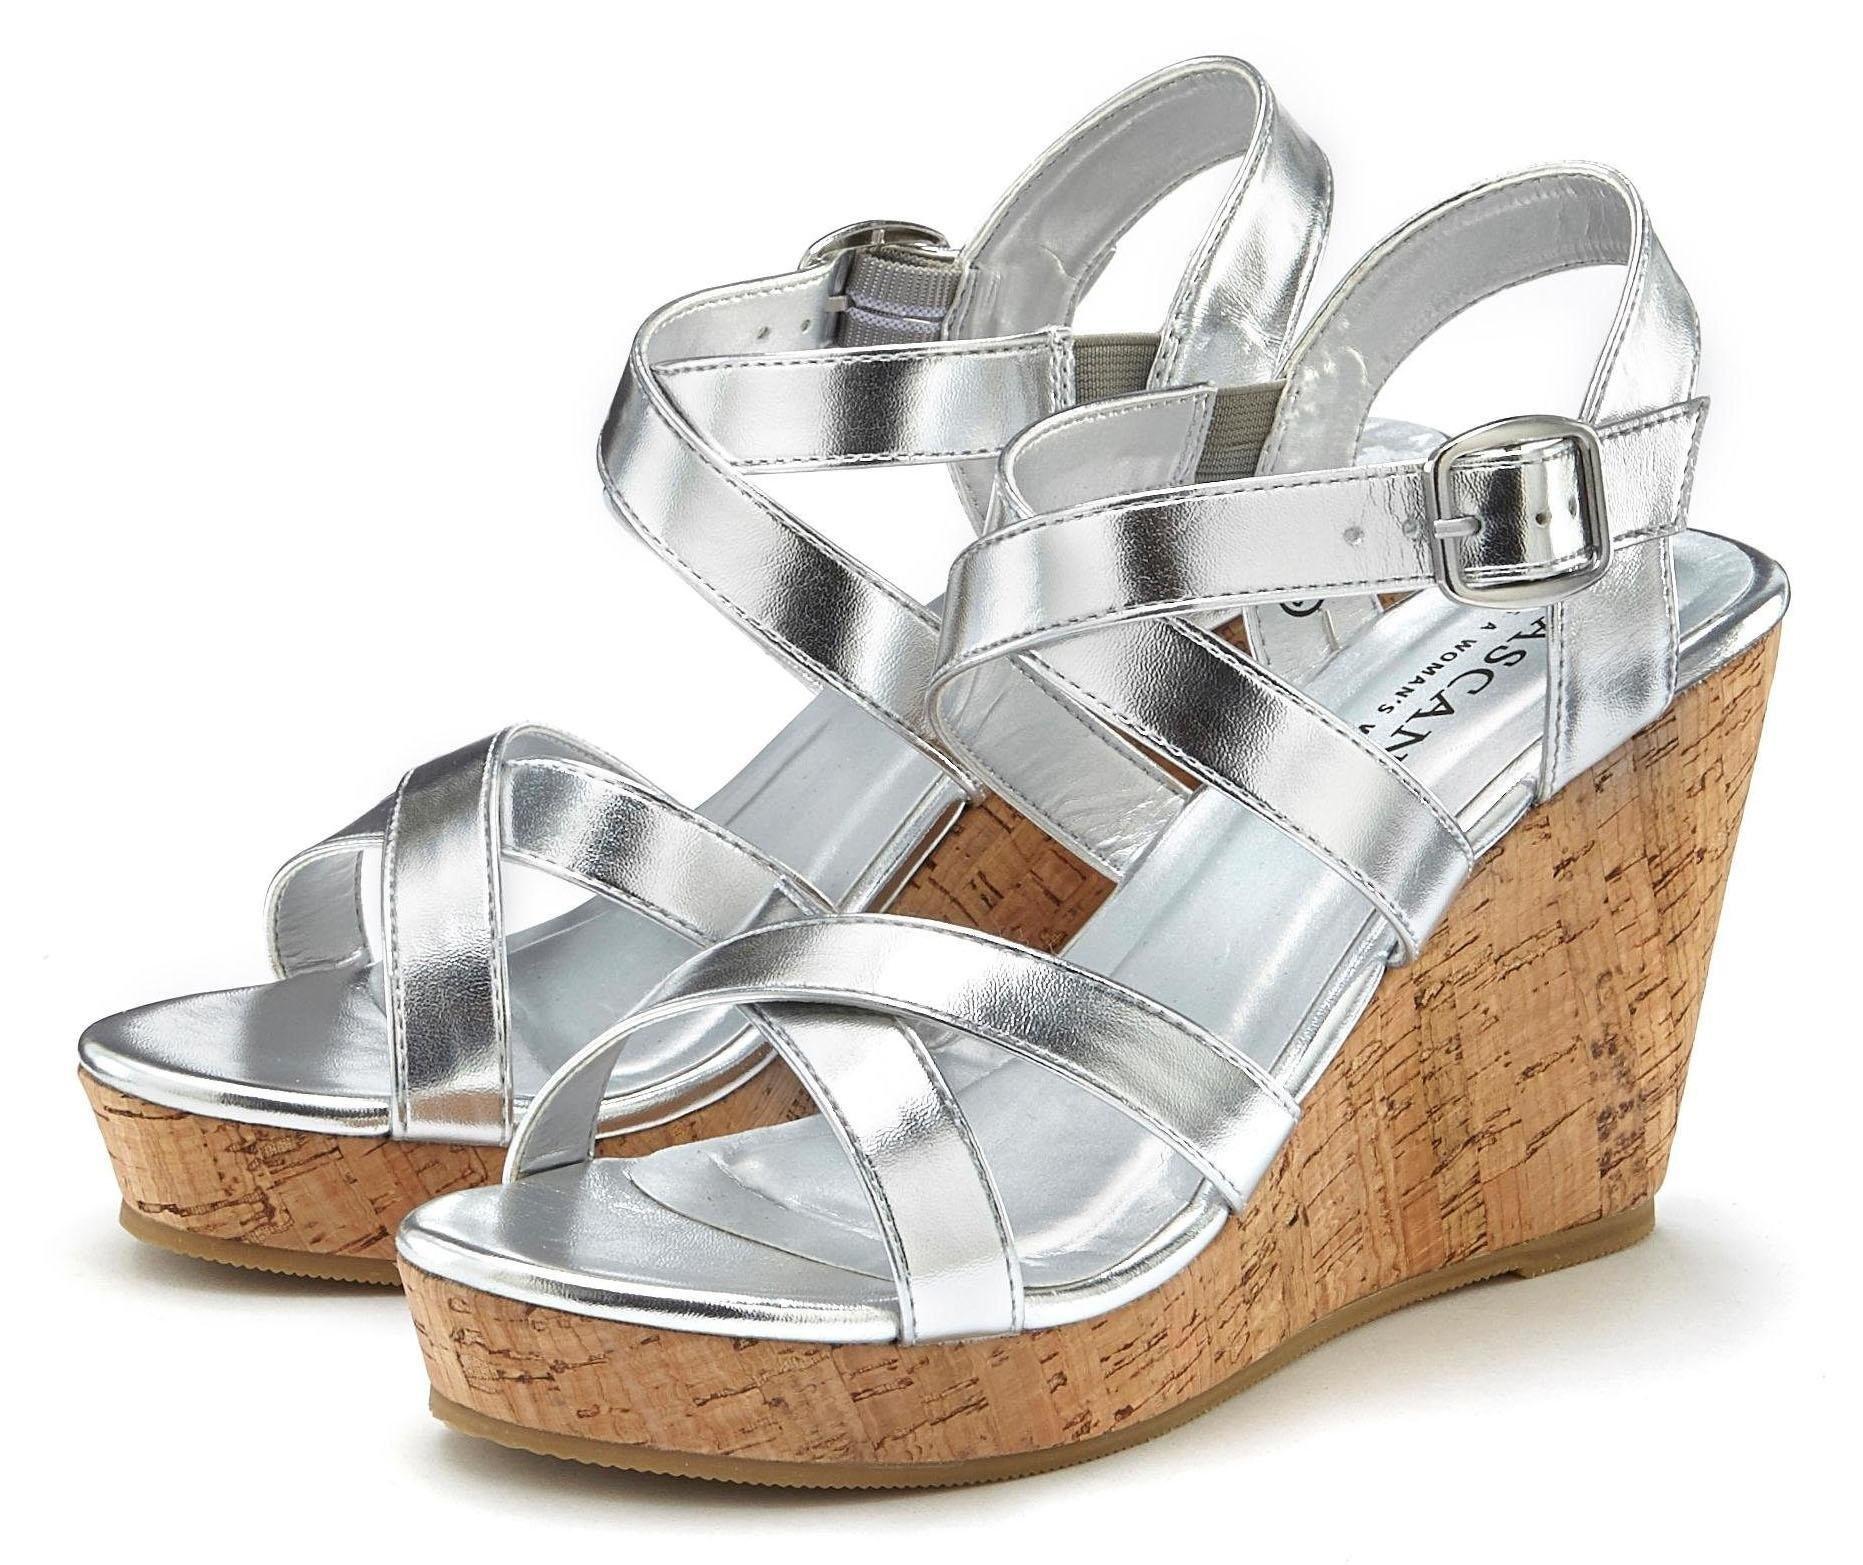 LASCANA highheel-sandaaltjes - verschillende betaalmethodes